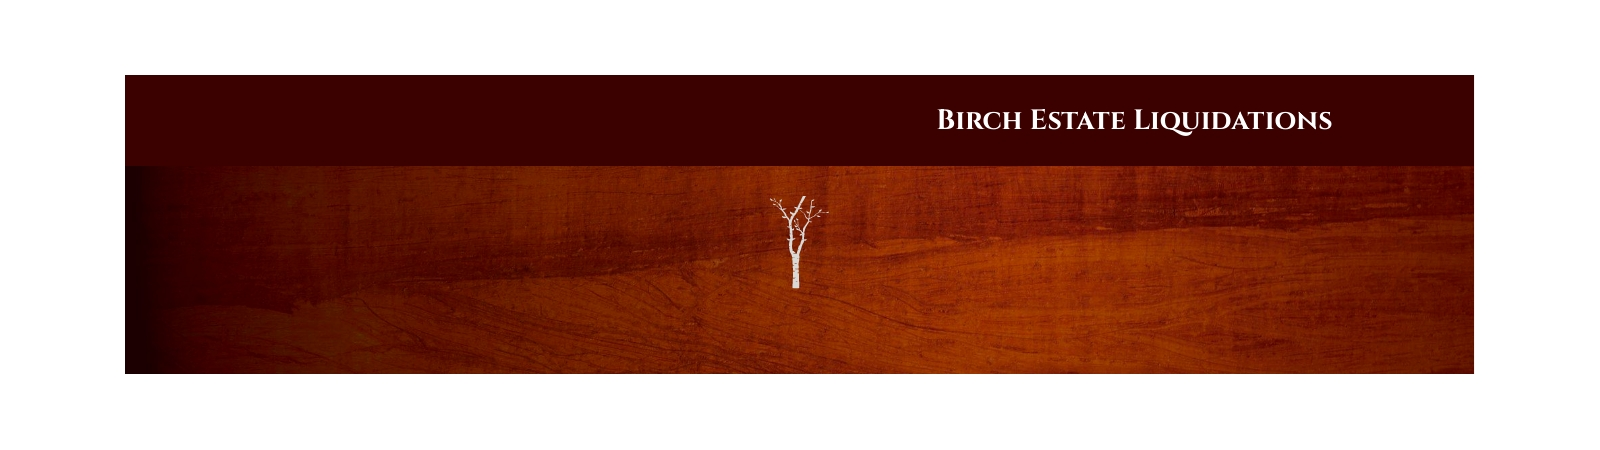 Birch Estate Liquidations | Auction Ninja